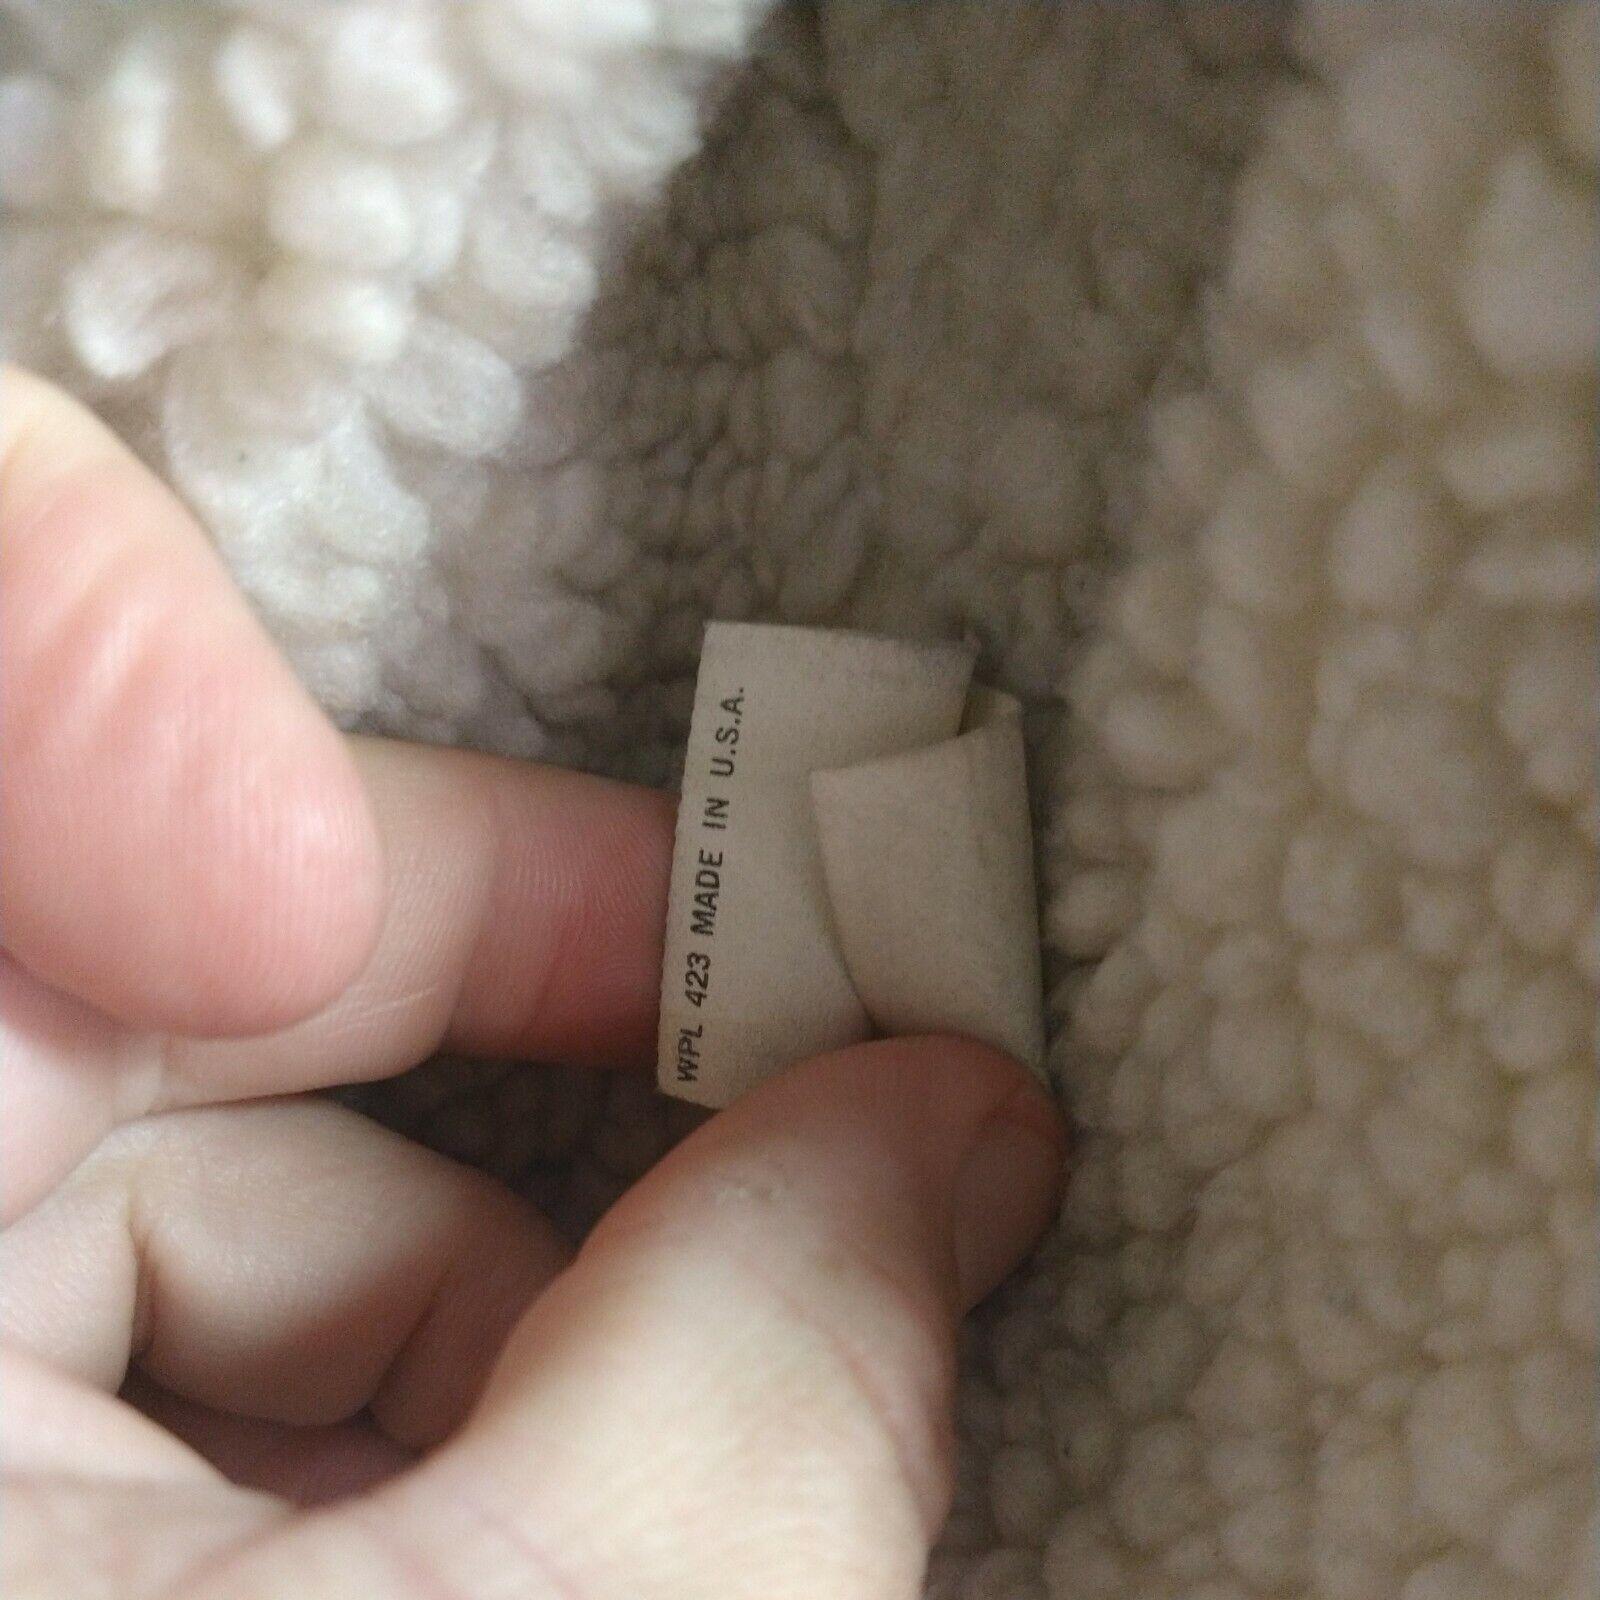 Levis vintage clothing Vest made in USA - image 11